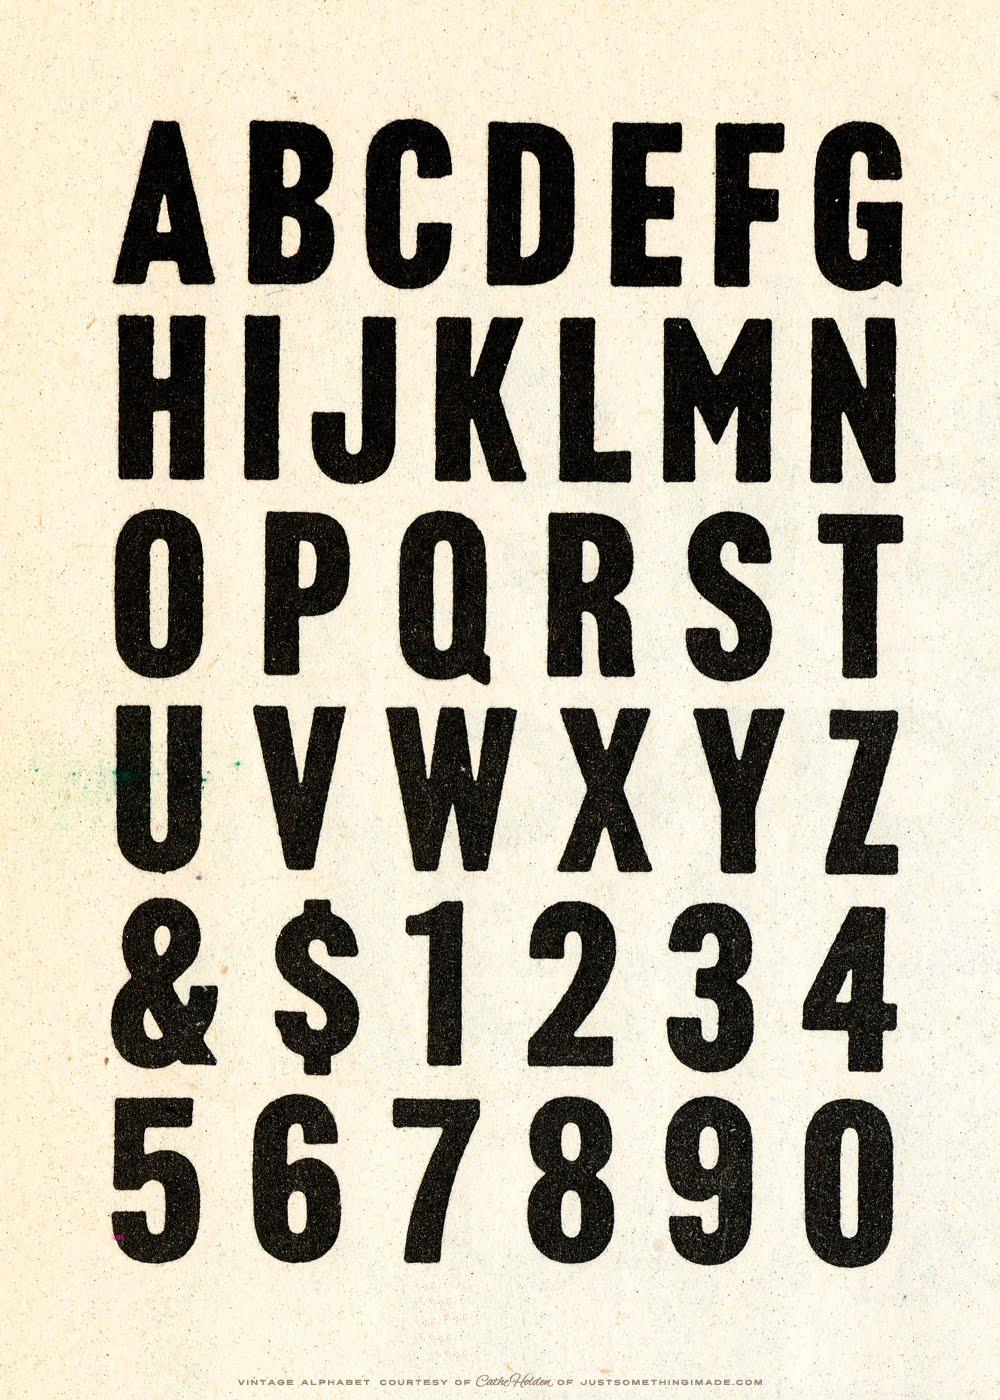 Free JSIM Vintage Alphabet Images Cathe Holdens